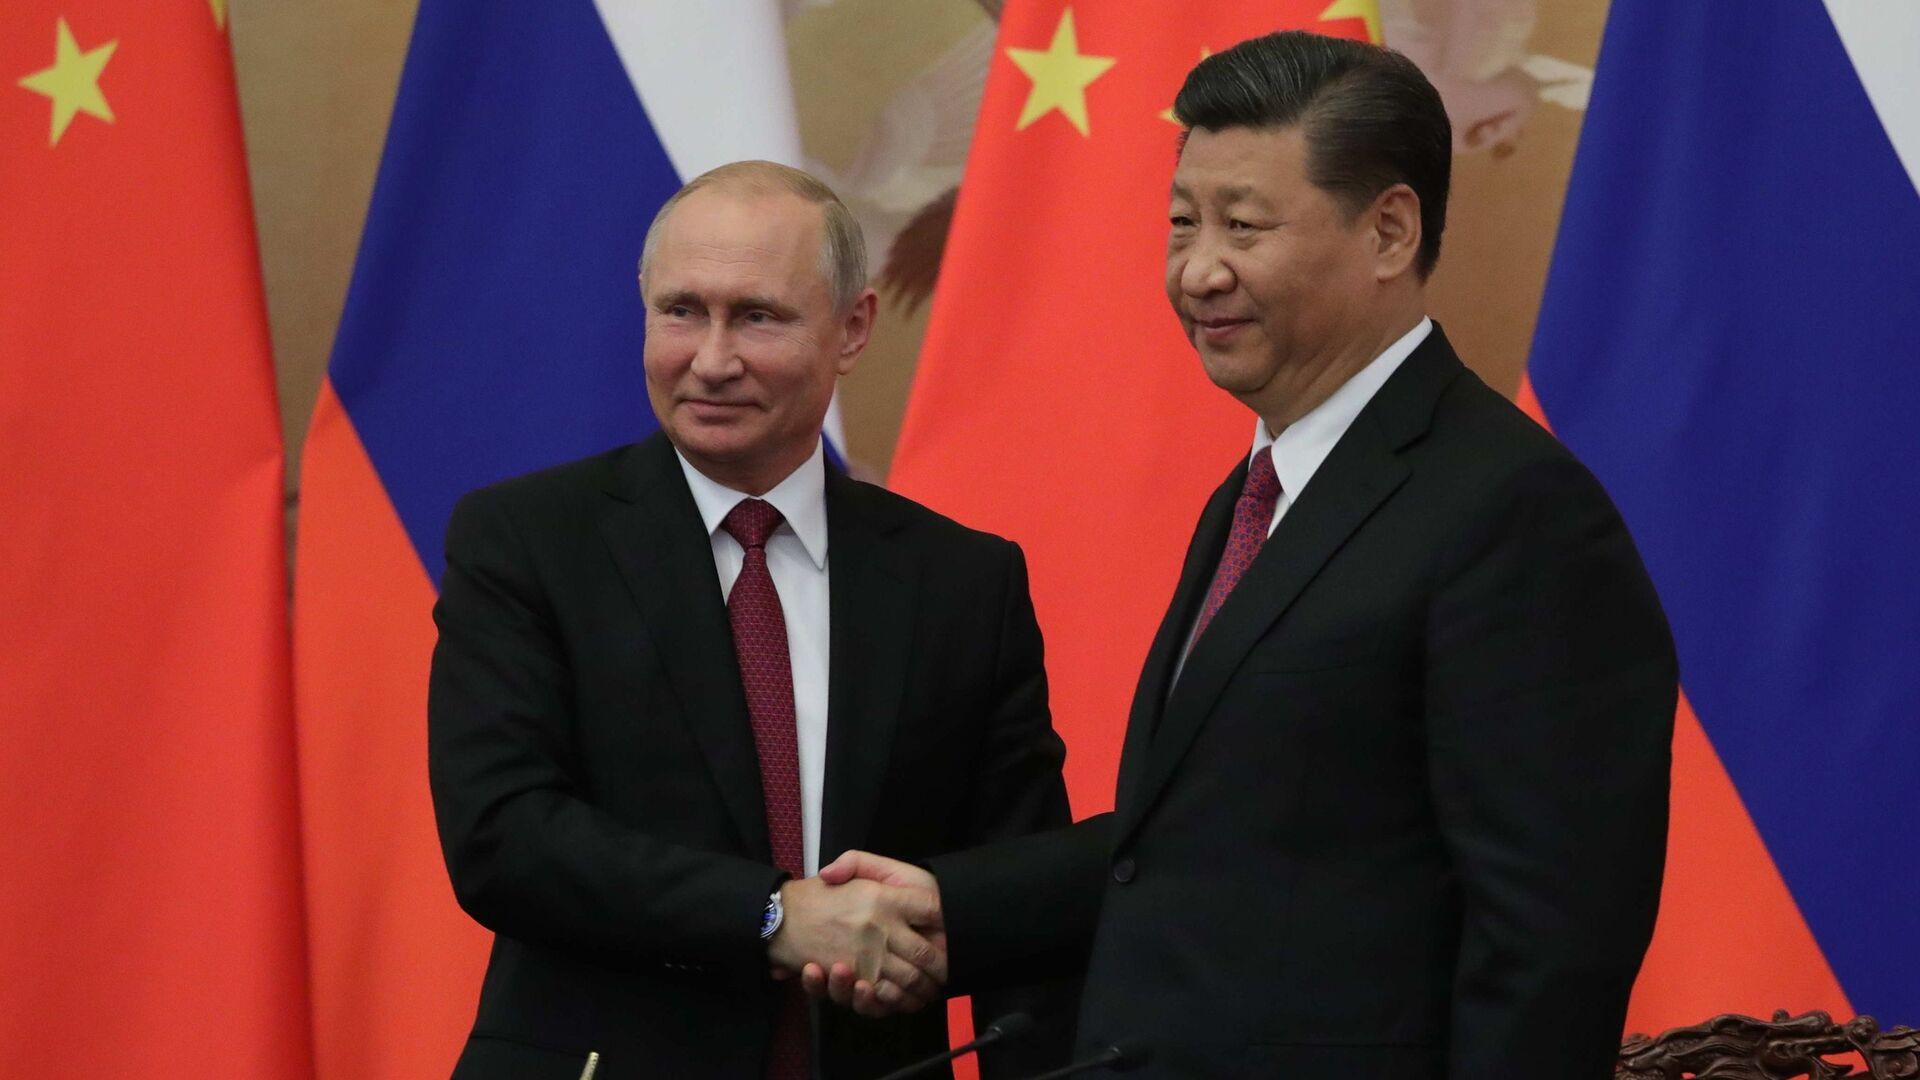 Президент РФ Владимир Путин и председатель КНР Си Цзиньпин - Sputnik Таджикистан, 1920, 14.10.2021